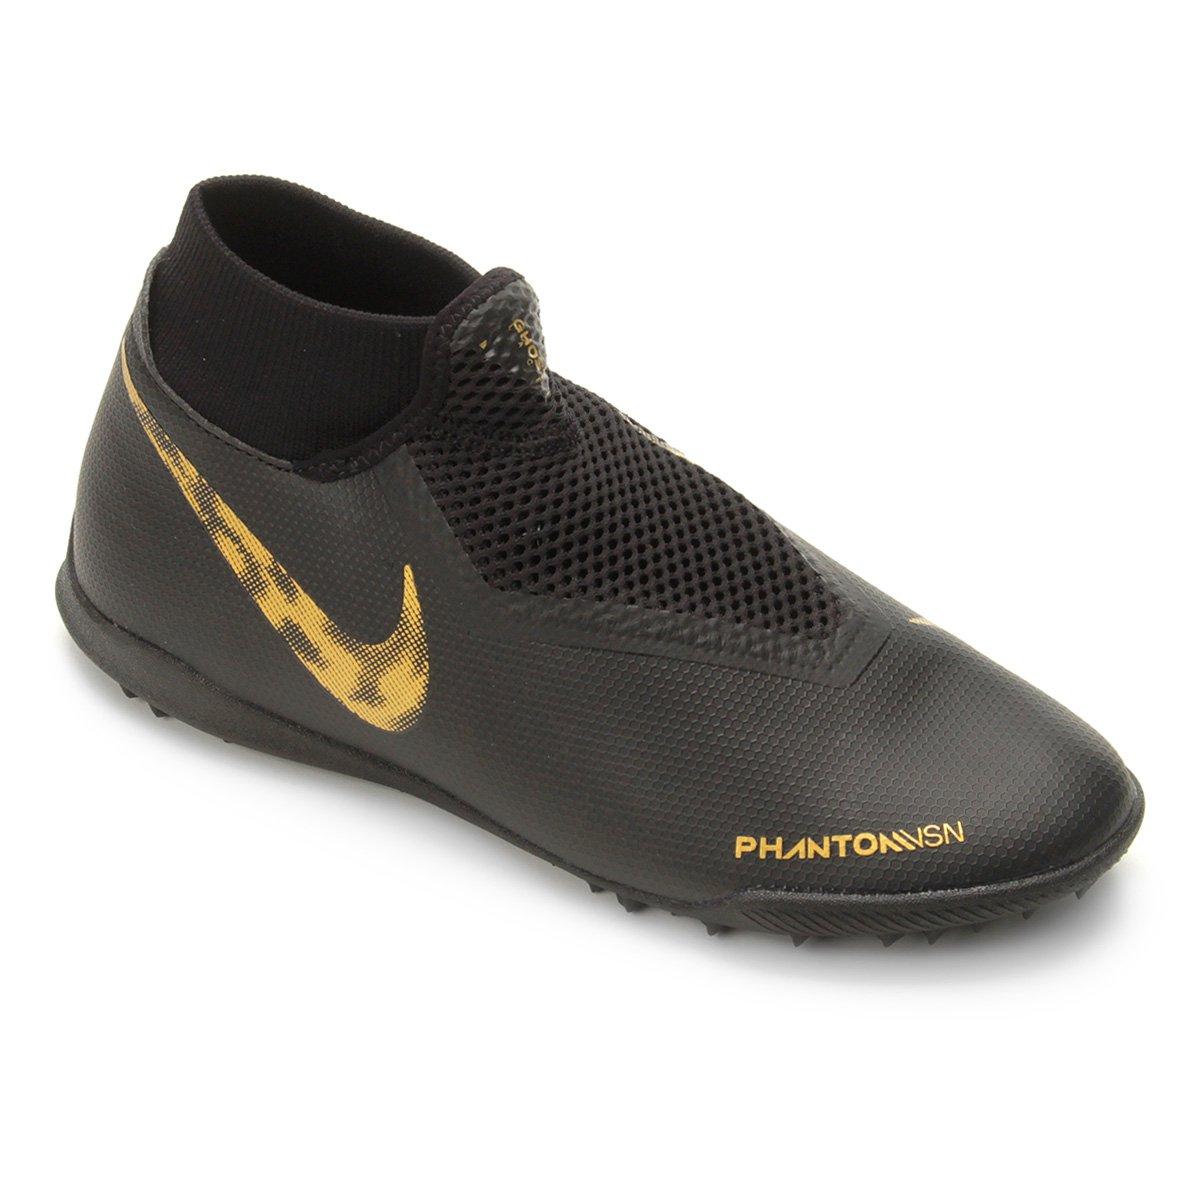 5174e0223ee Chuteira Society Nike Phantom Vision Academy DF TF - Preto e Dourado -  Compre Agora